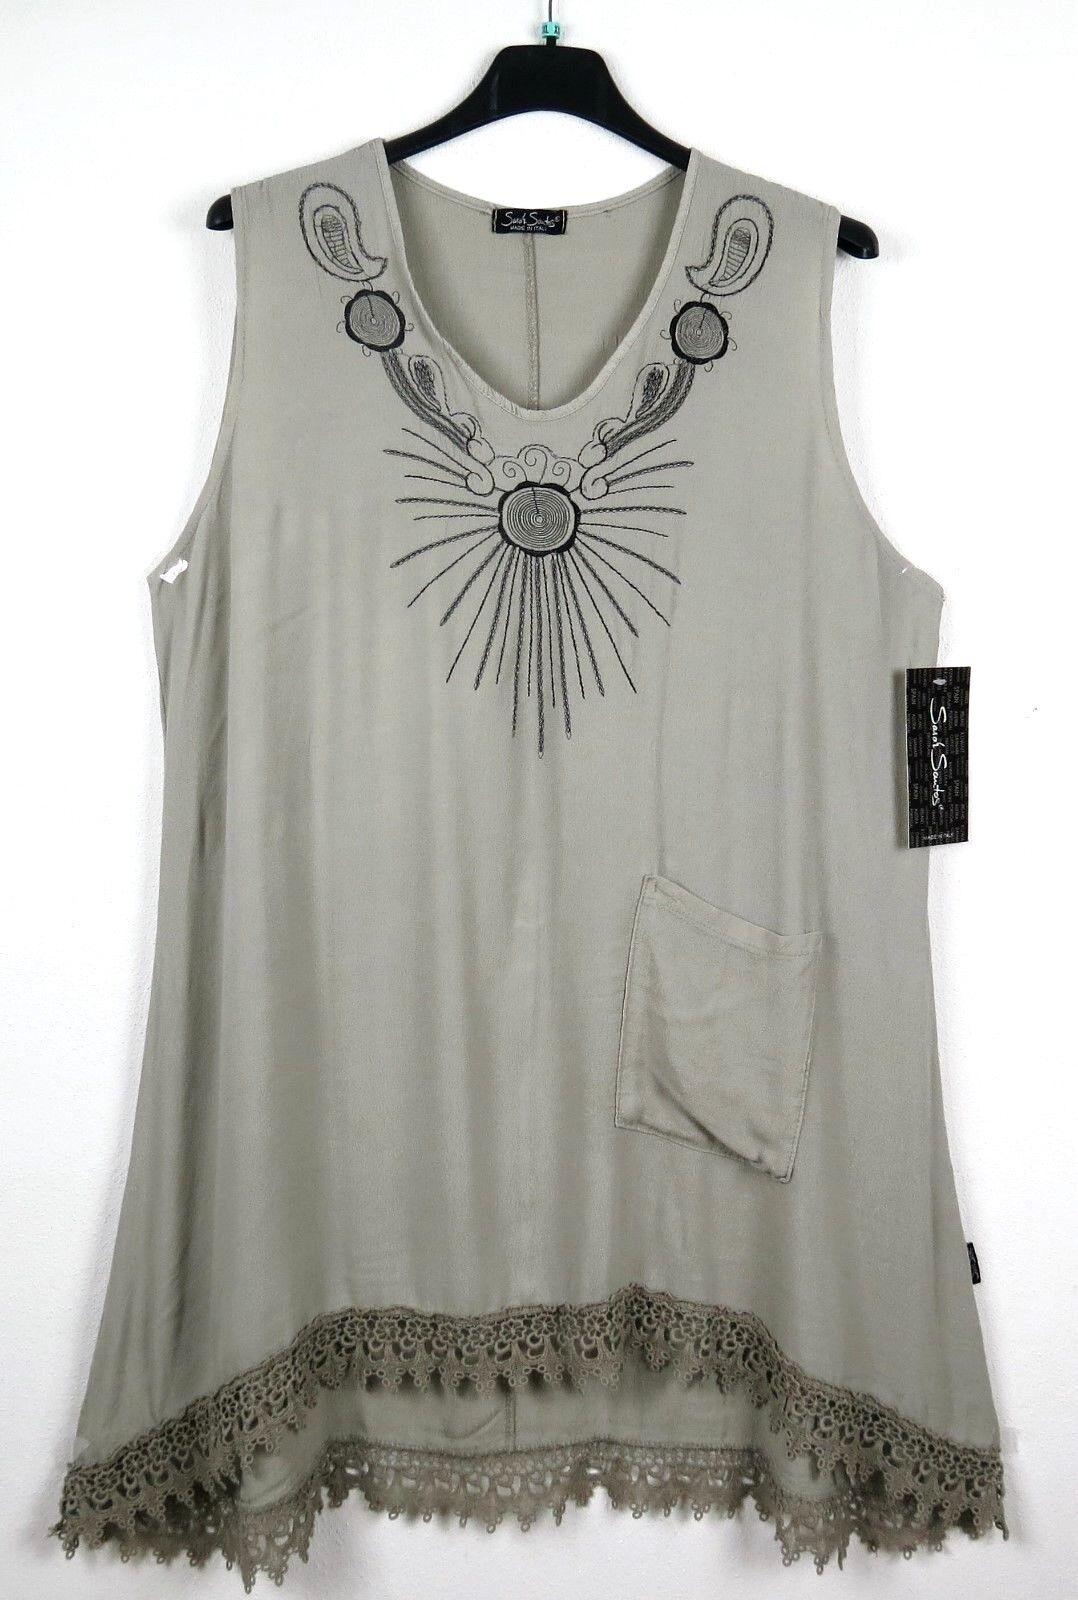 SARAH SANTOS Tunika 30% Seide Tunic Tunique Kleid Dress Robe XL 48 50 Lagenlook